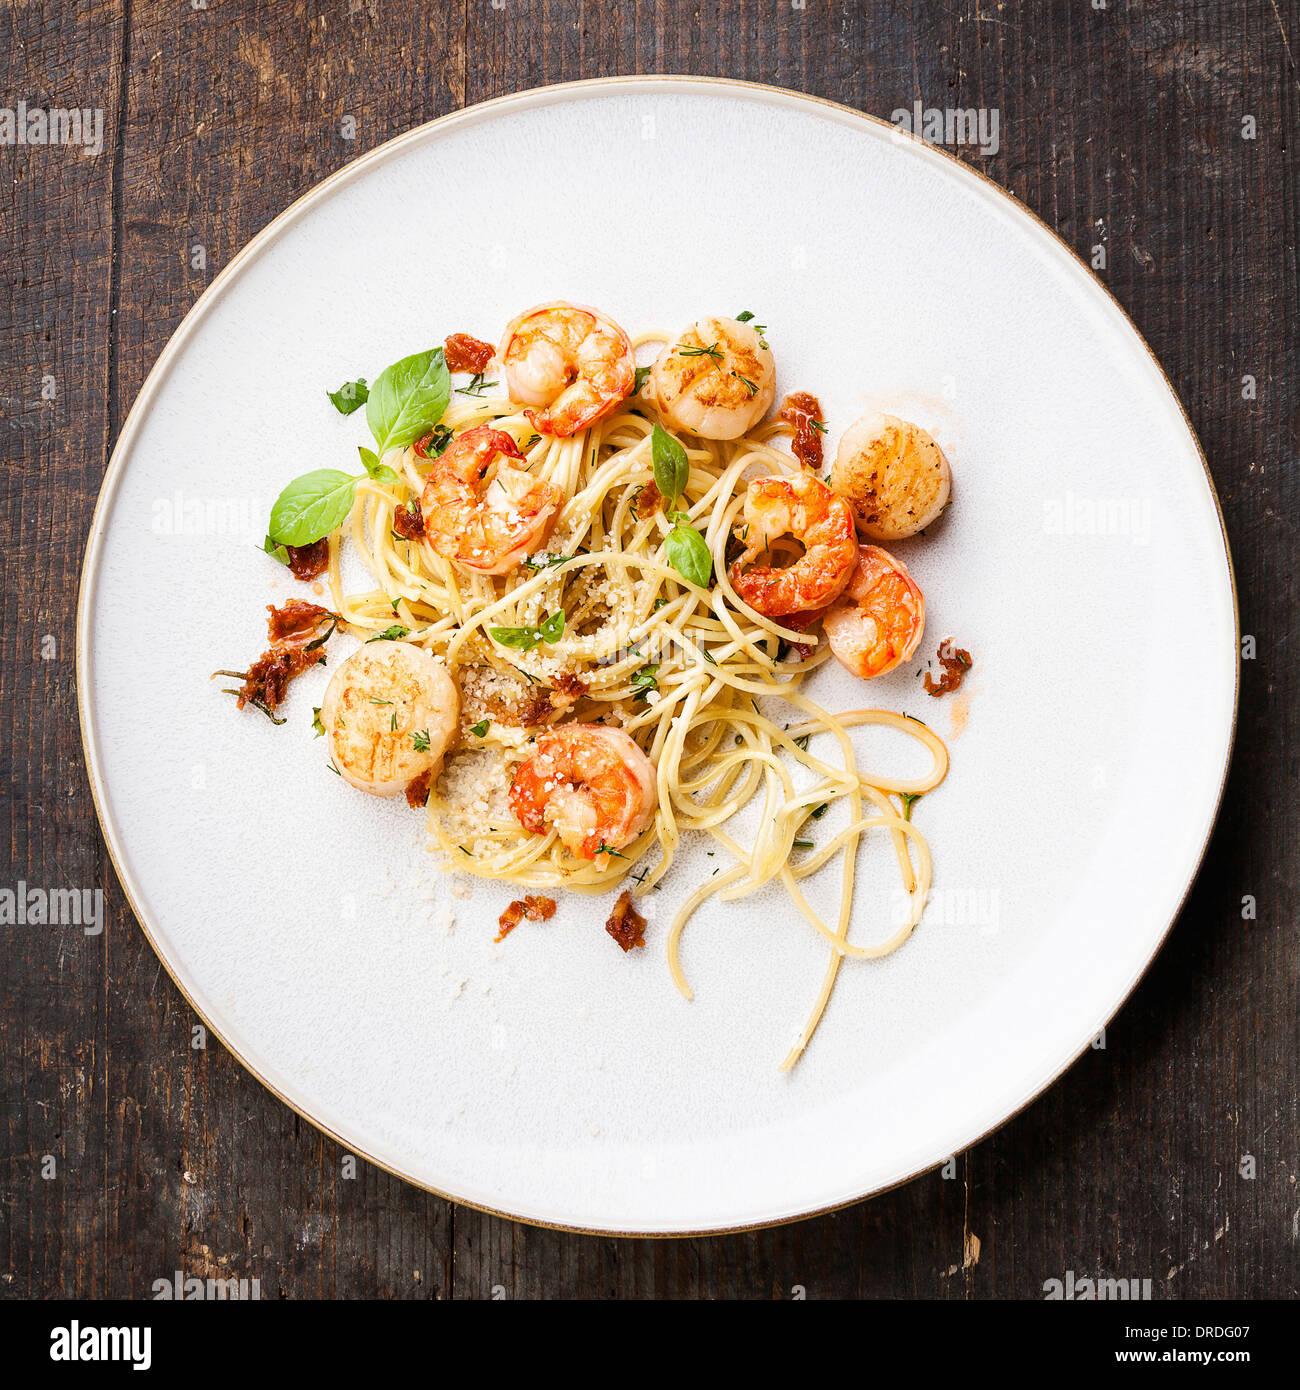 Spaghetti mit Garnelen, Jakobsmuscheln und Basilikum Stockbild